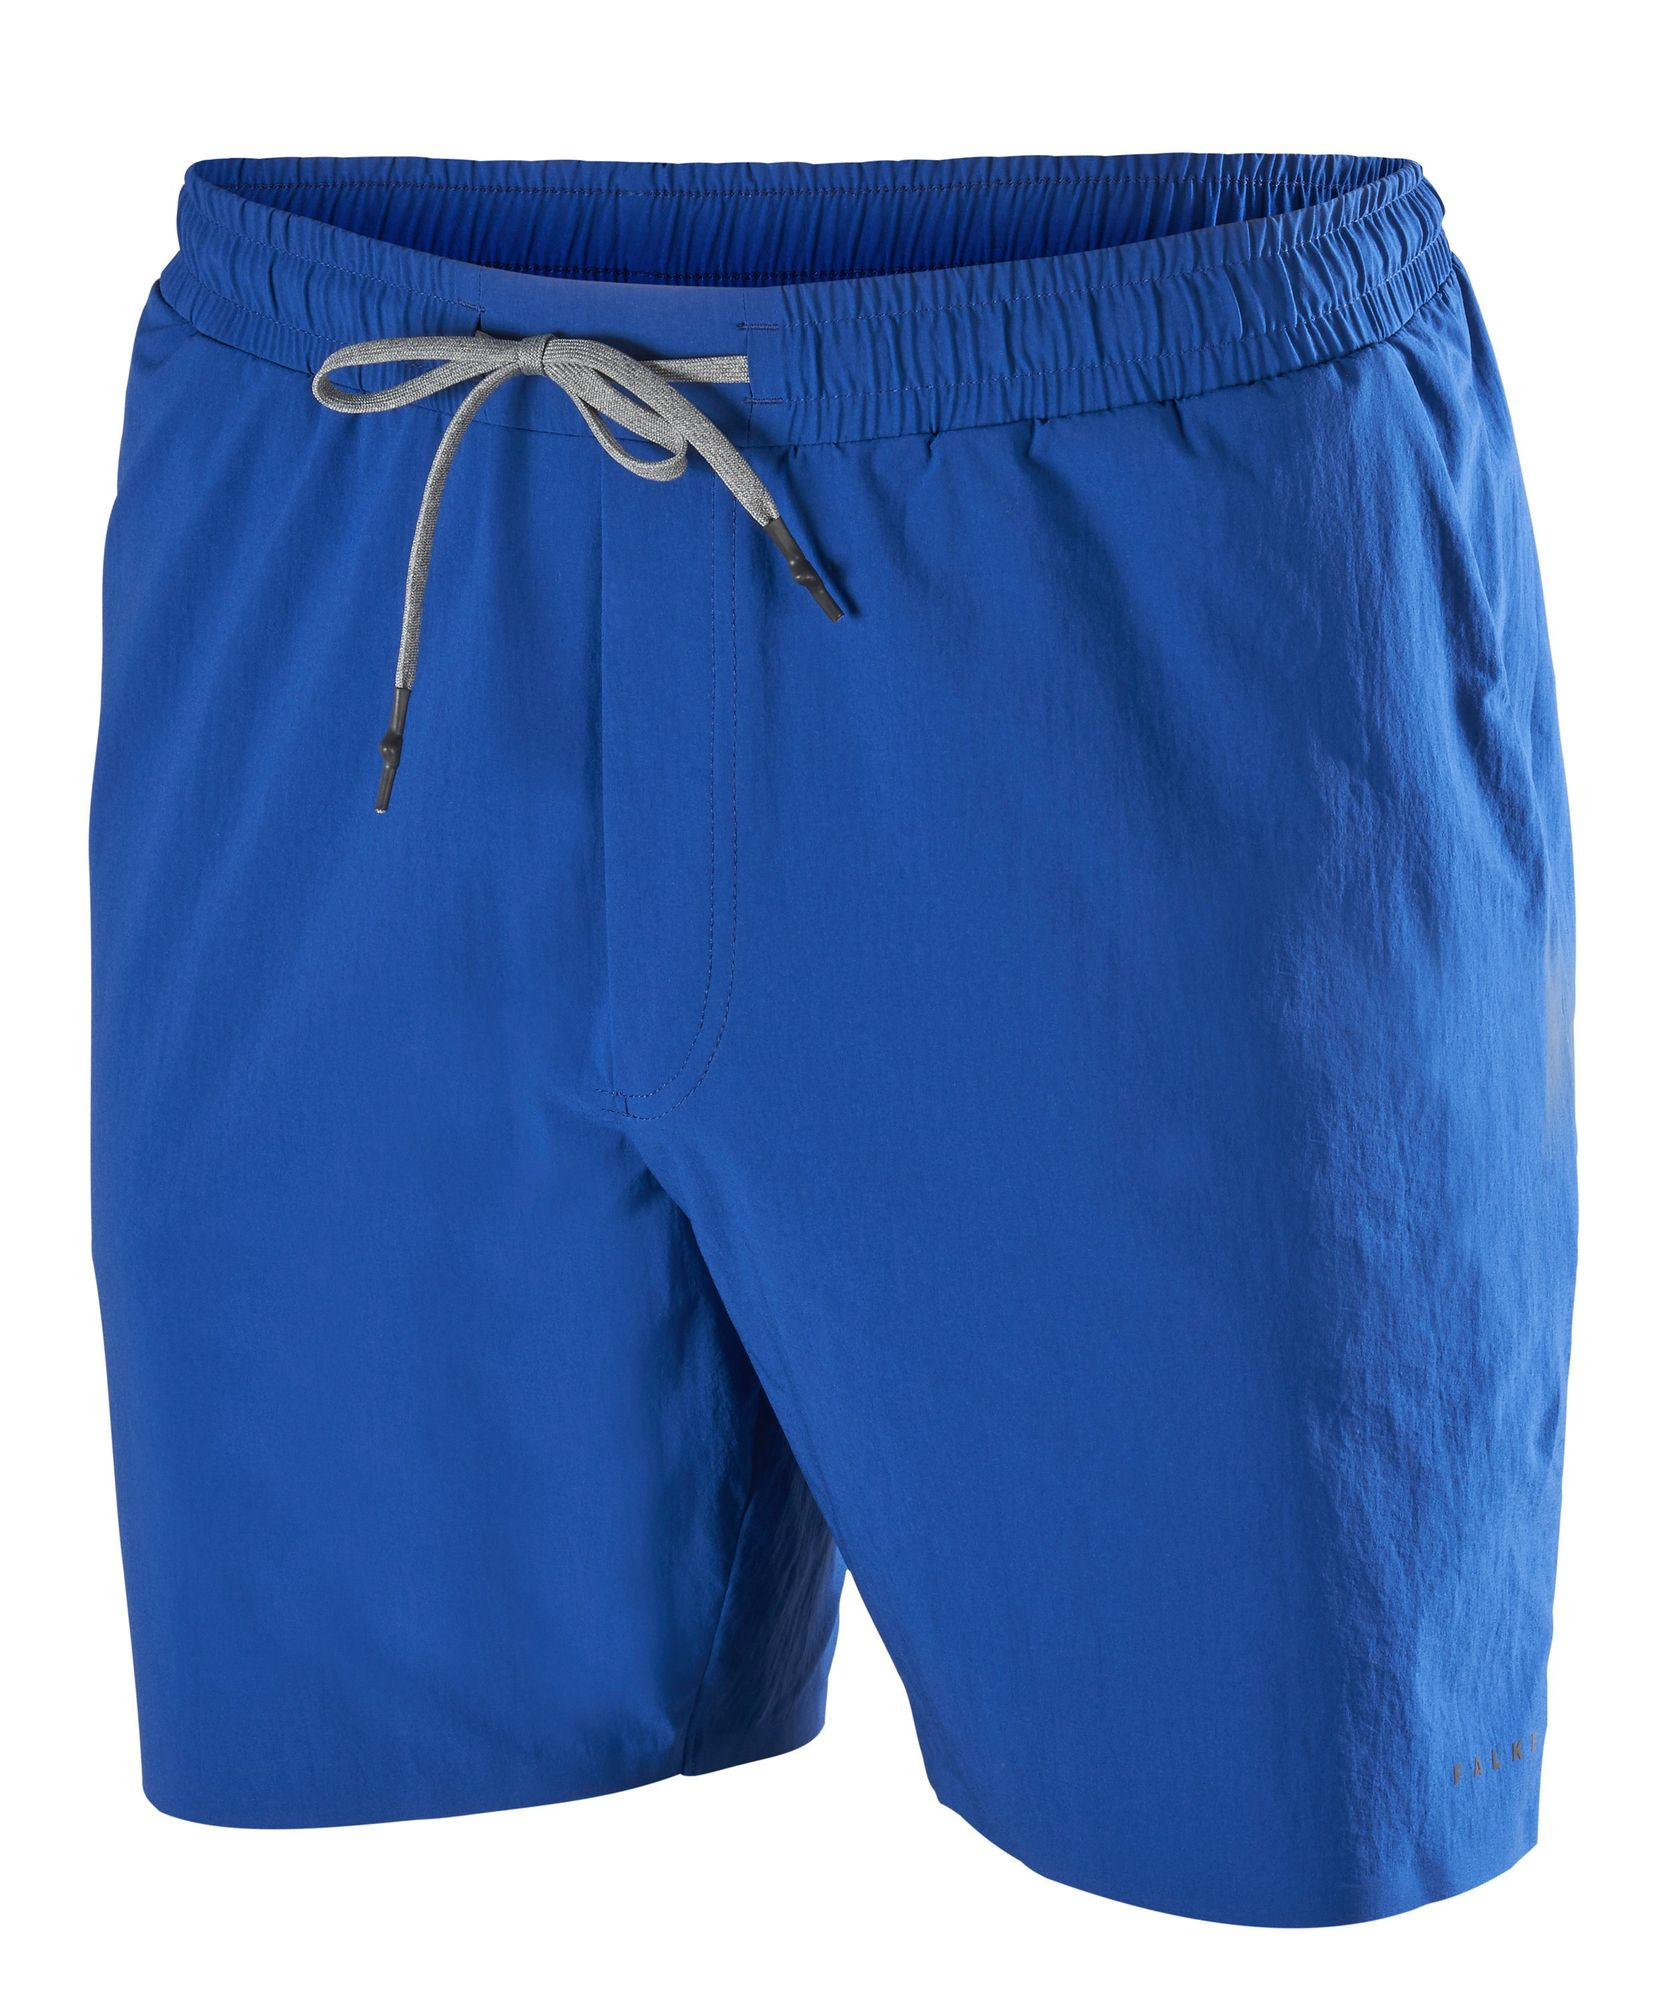 Falke Basic Challenger Shorts (Blau)